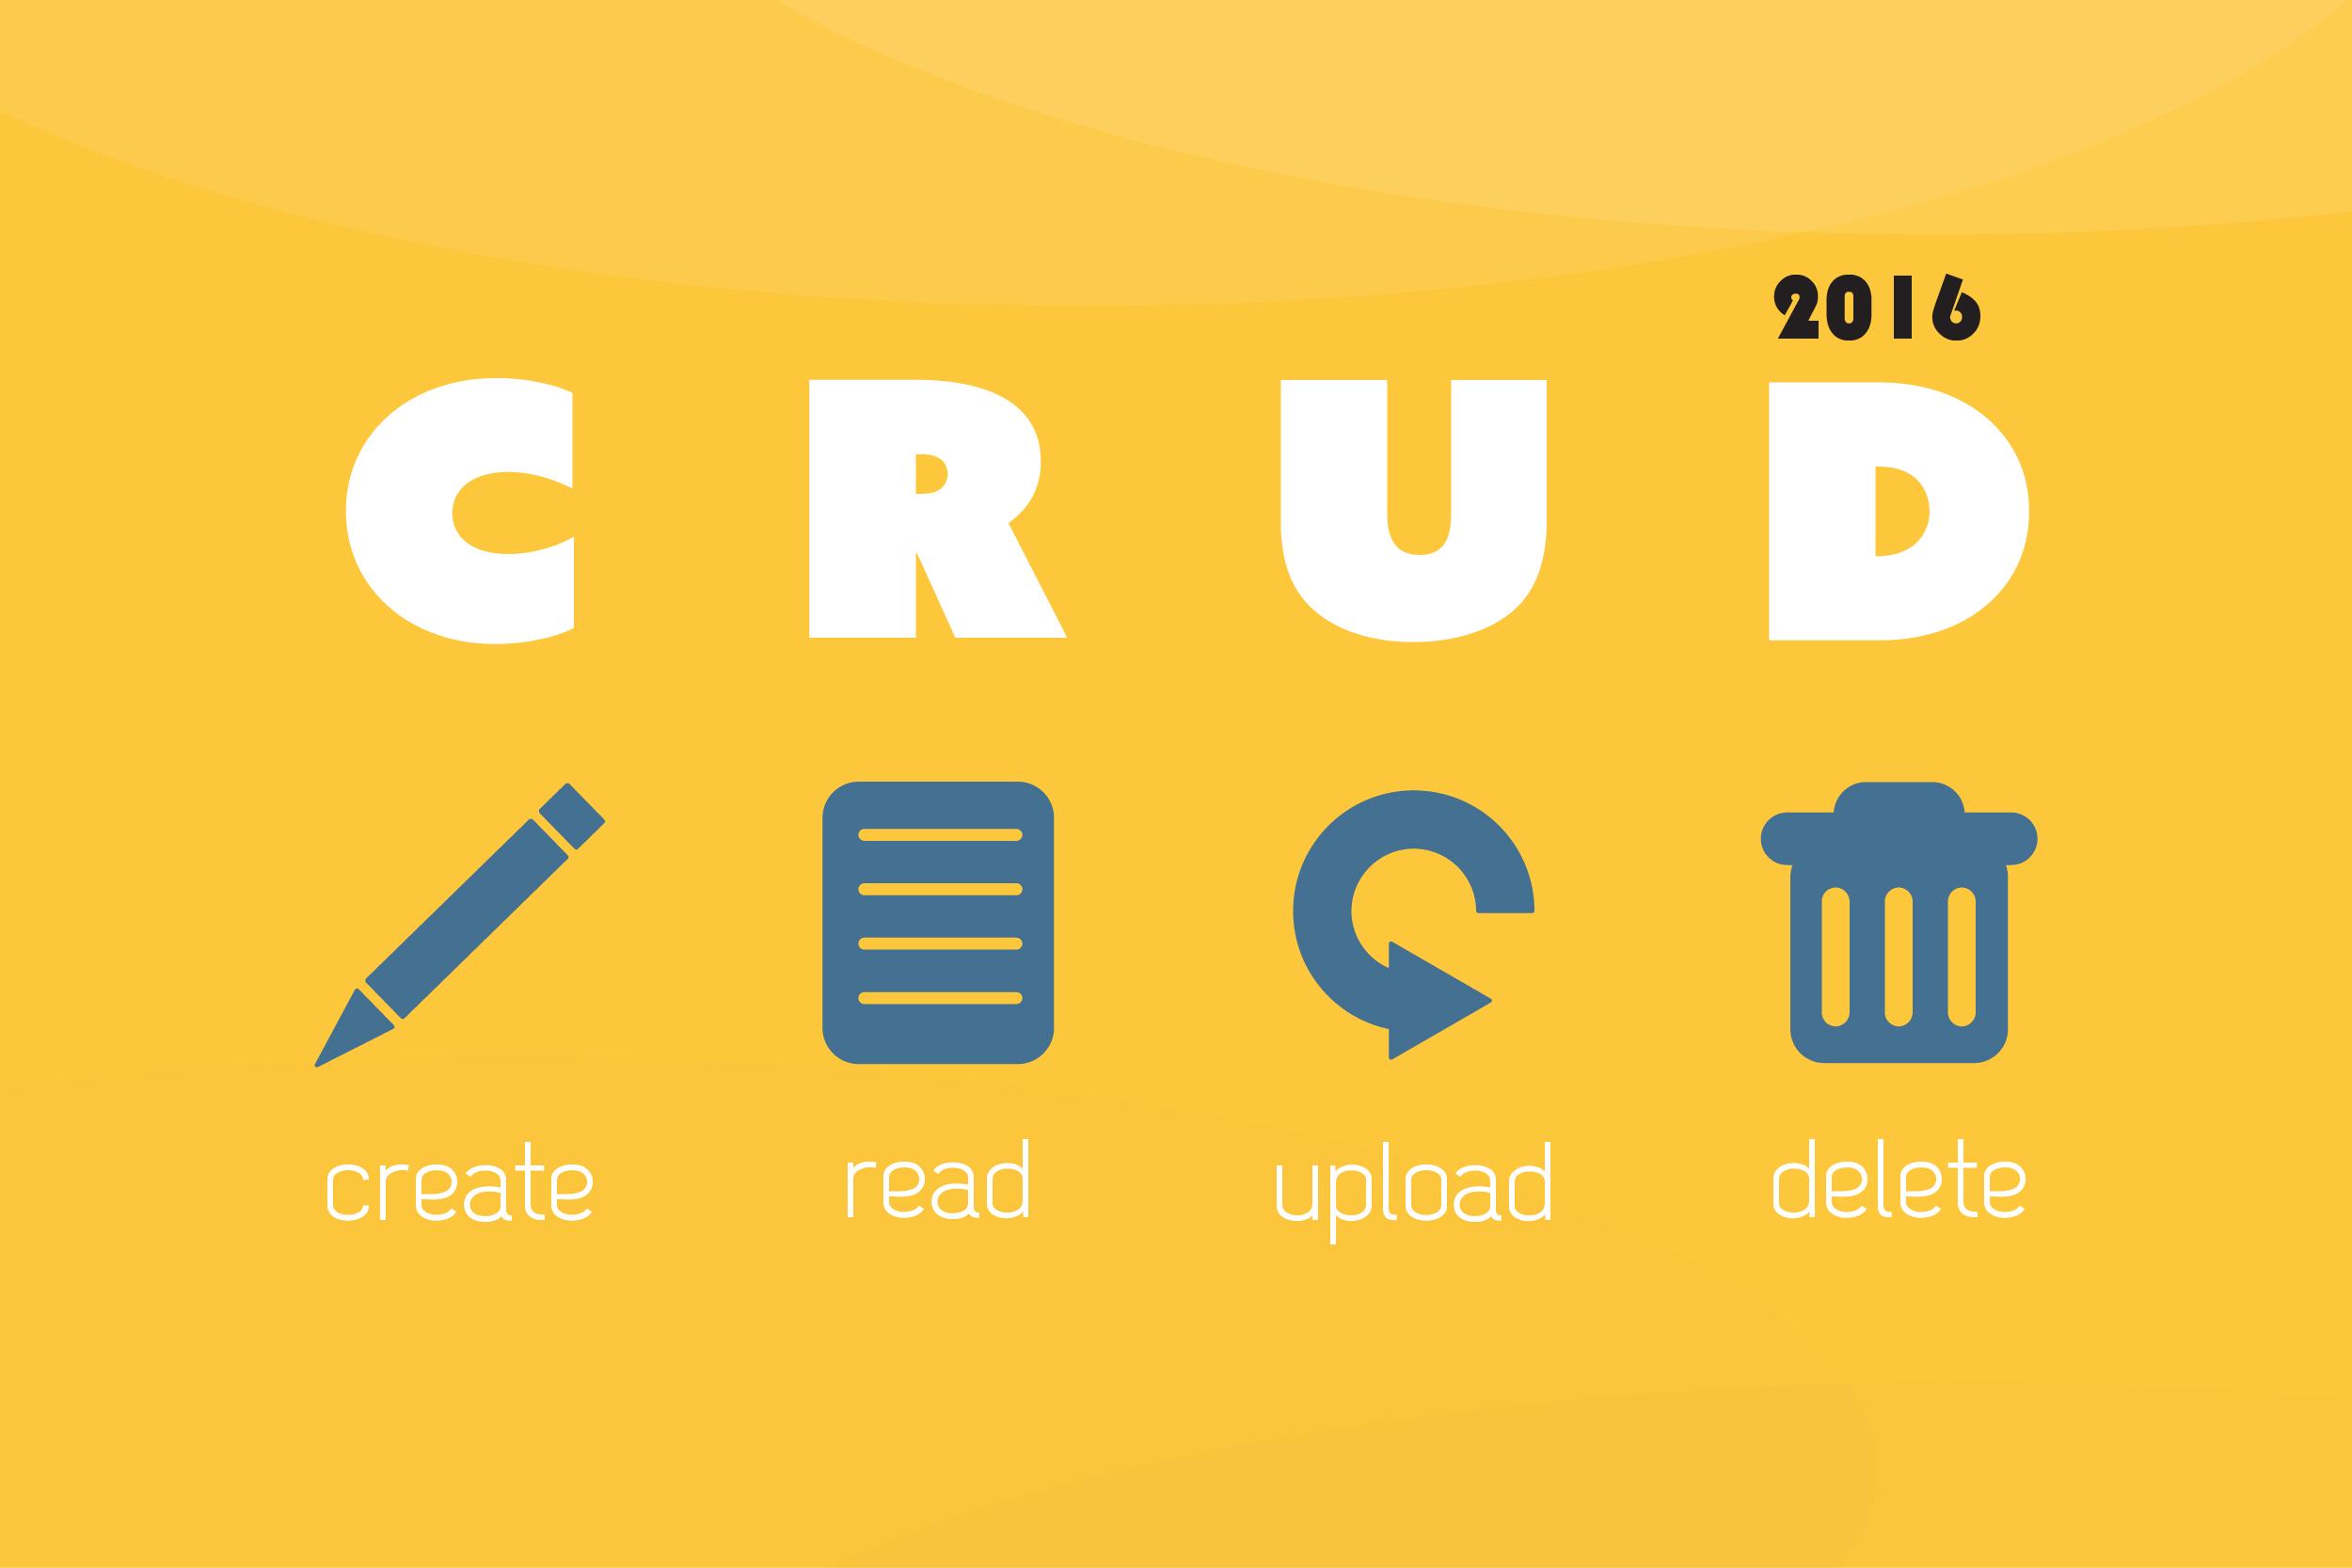 Crud2016